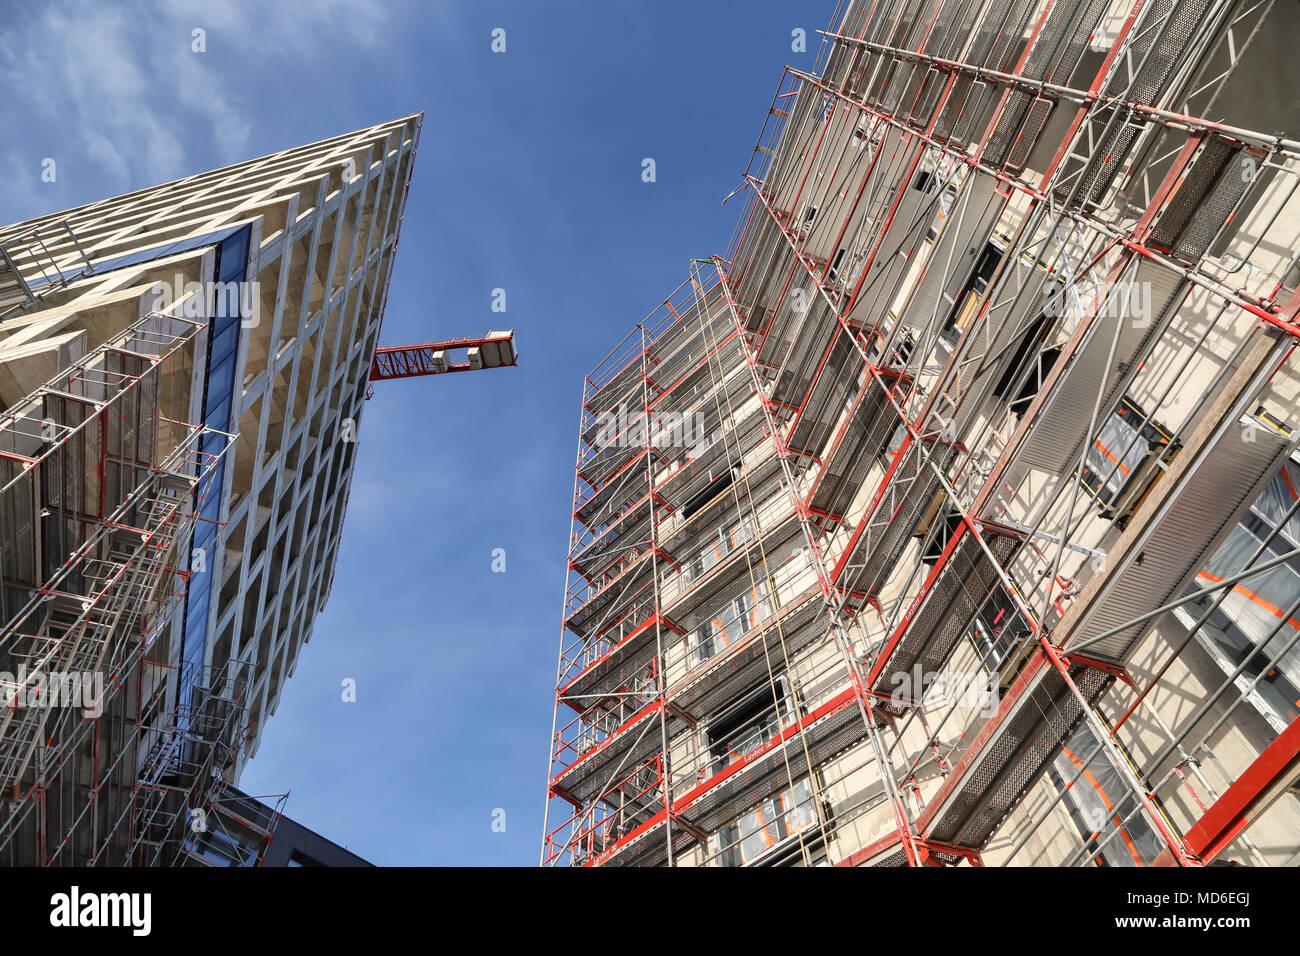 Stahlbeton Skelettbau Stock Photos & Stahlbeton Skelettbau Stock ...